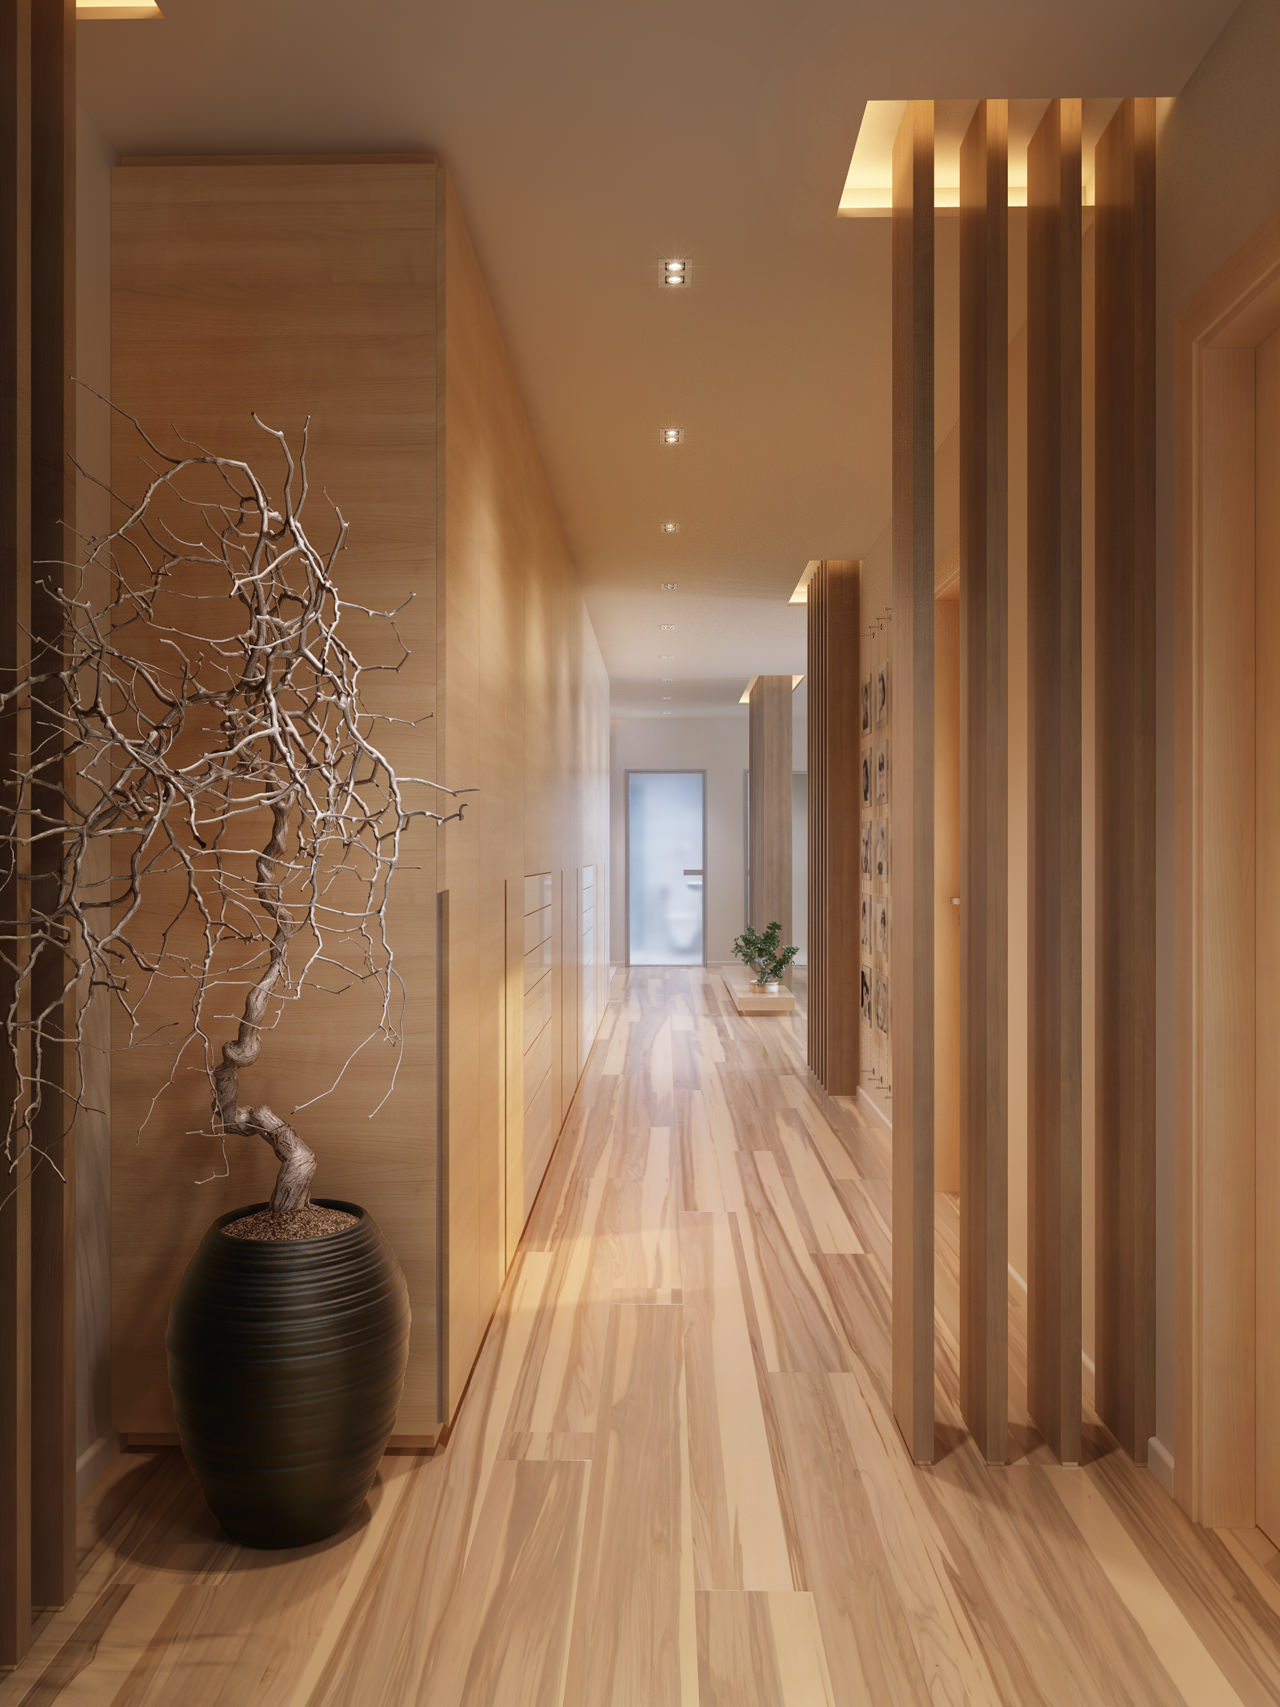 28-Hallway-decor